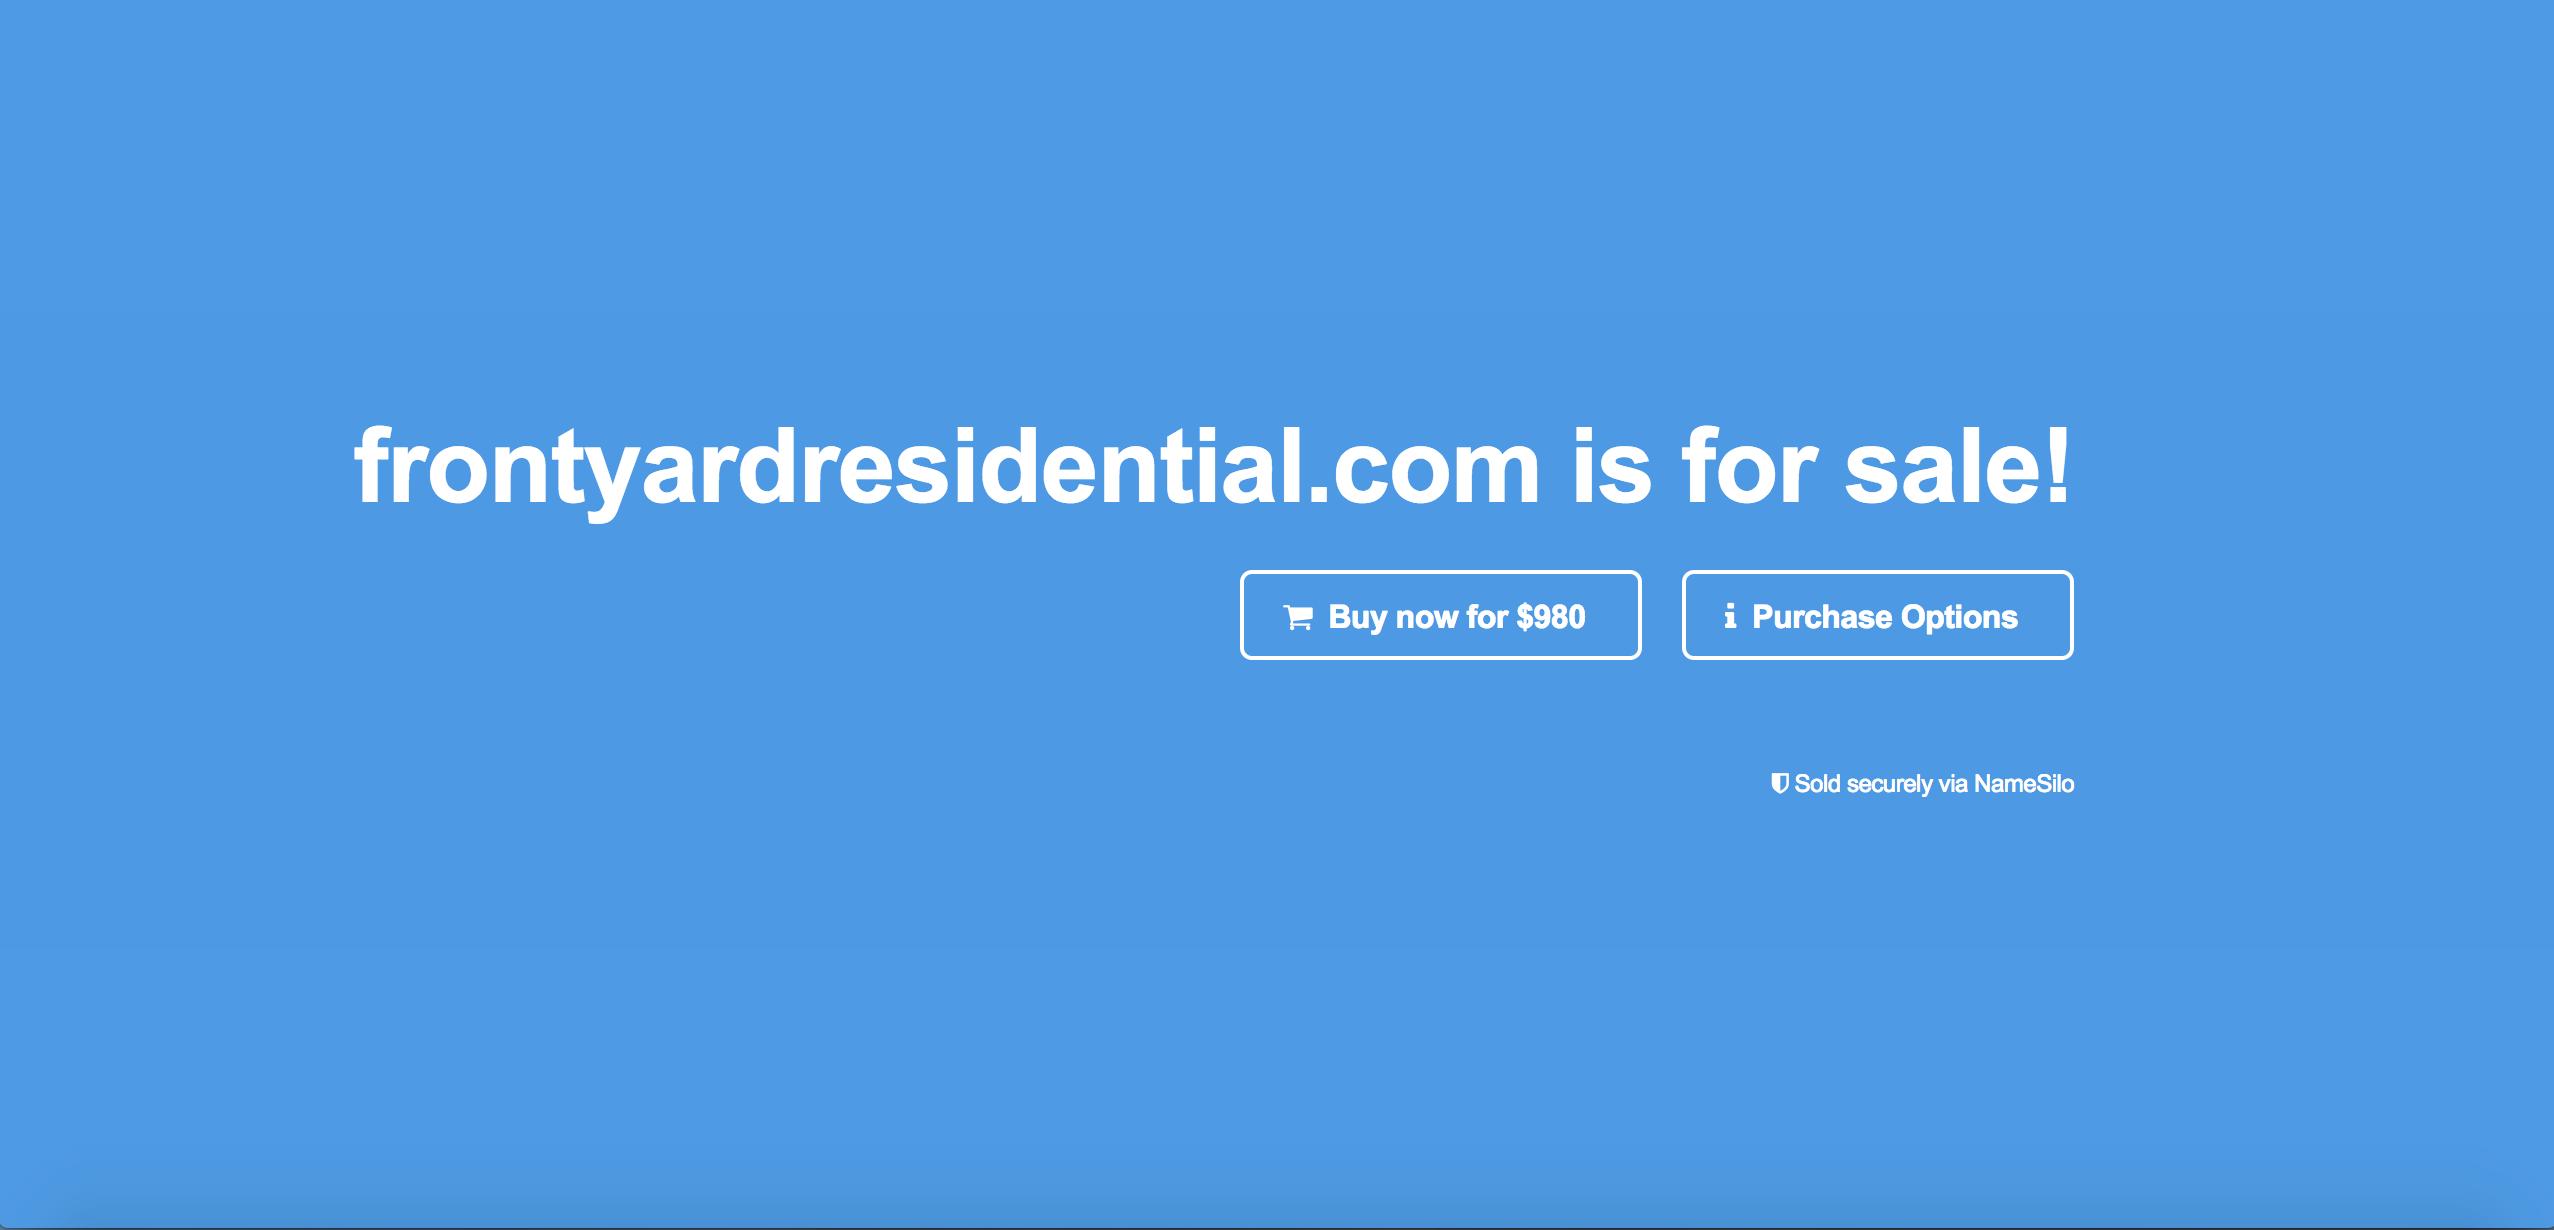 Frontyardresidential.com